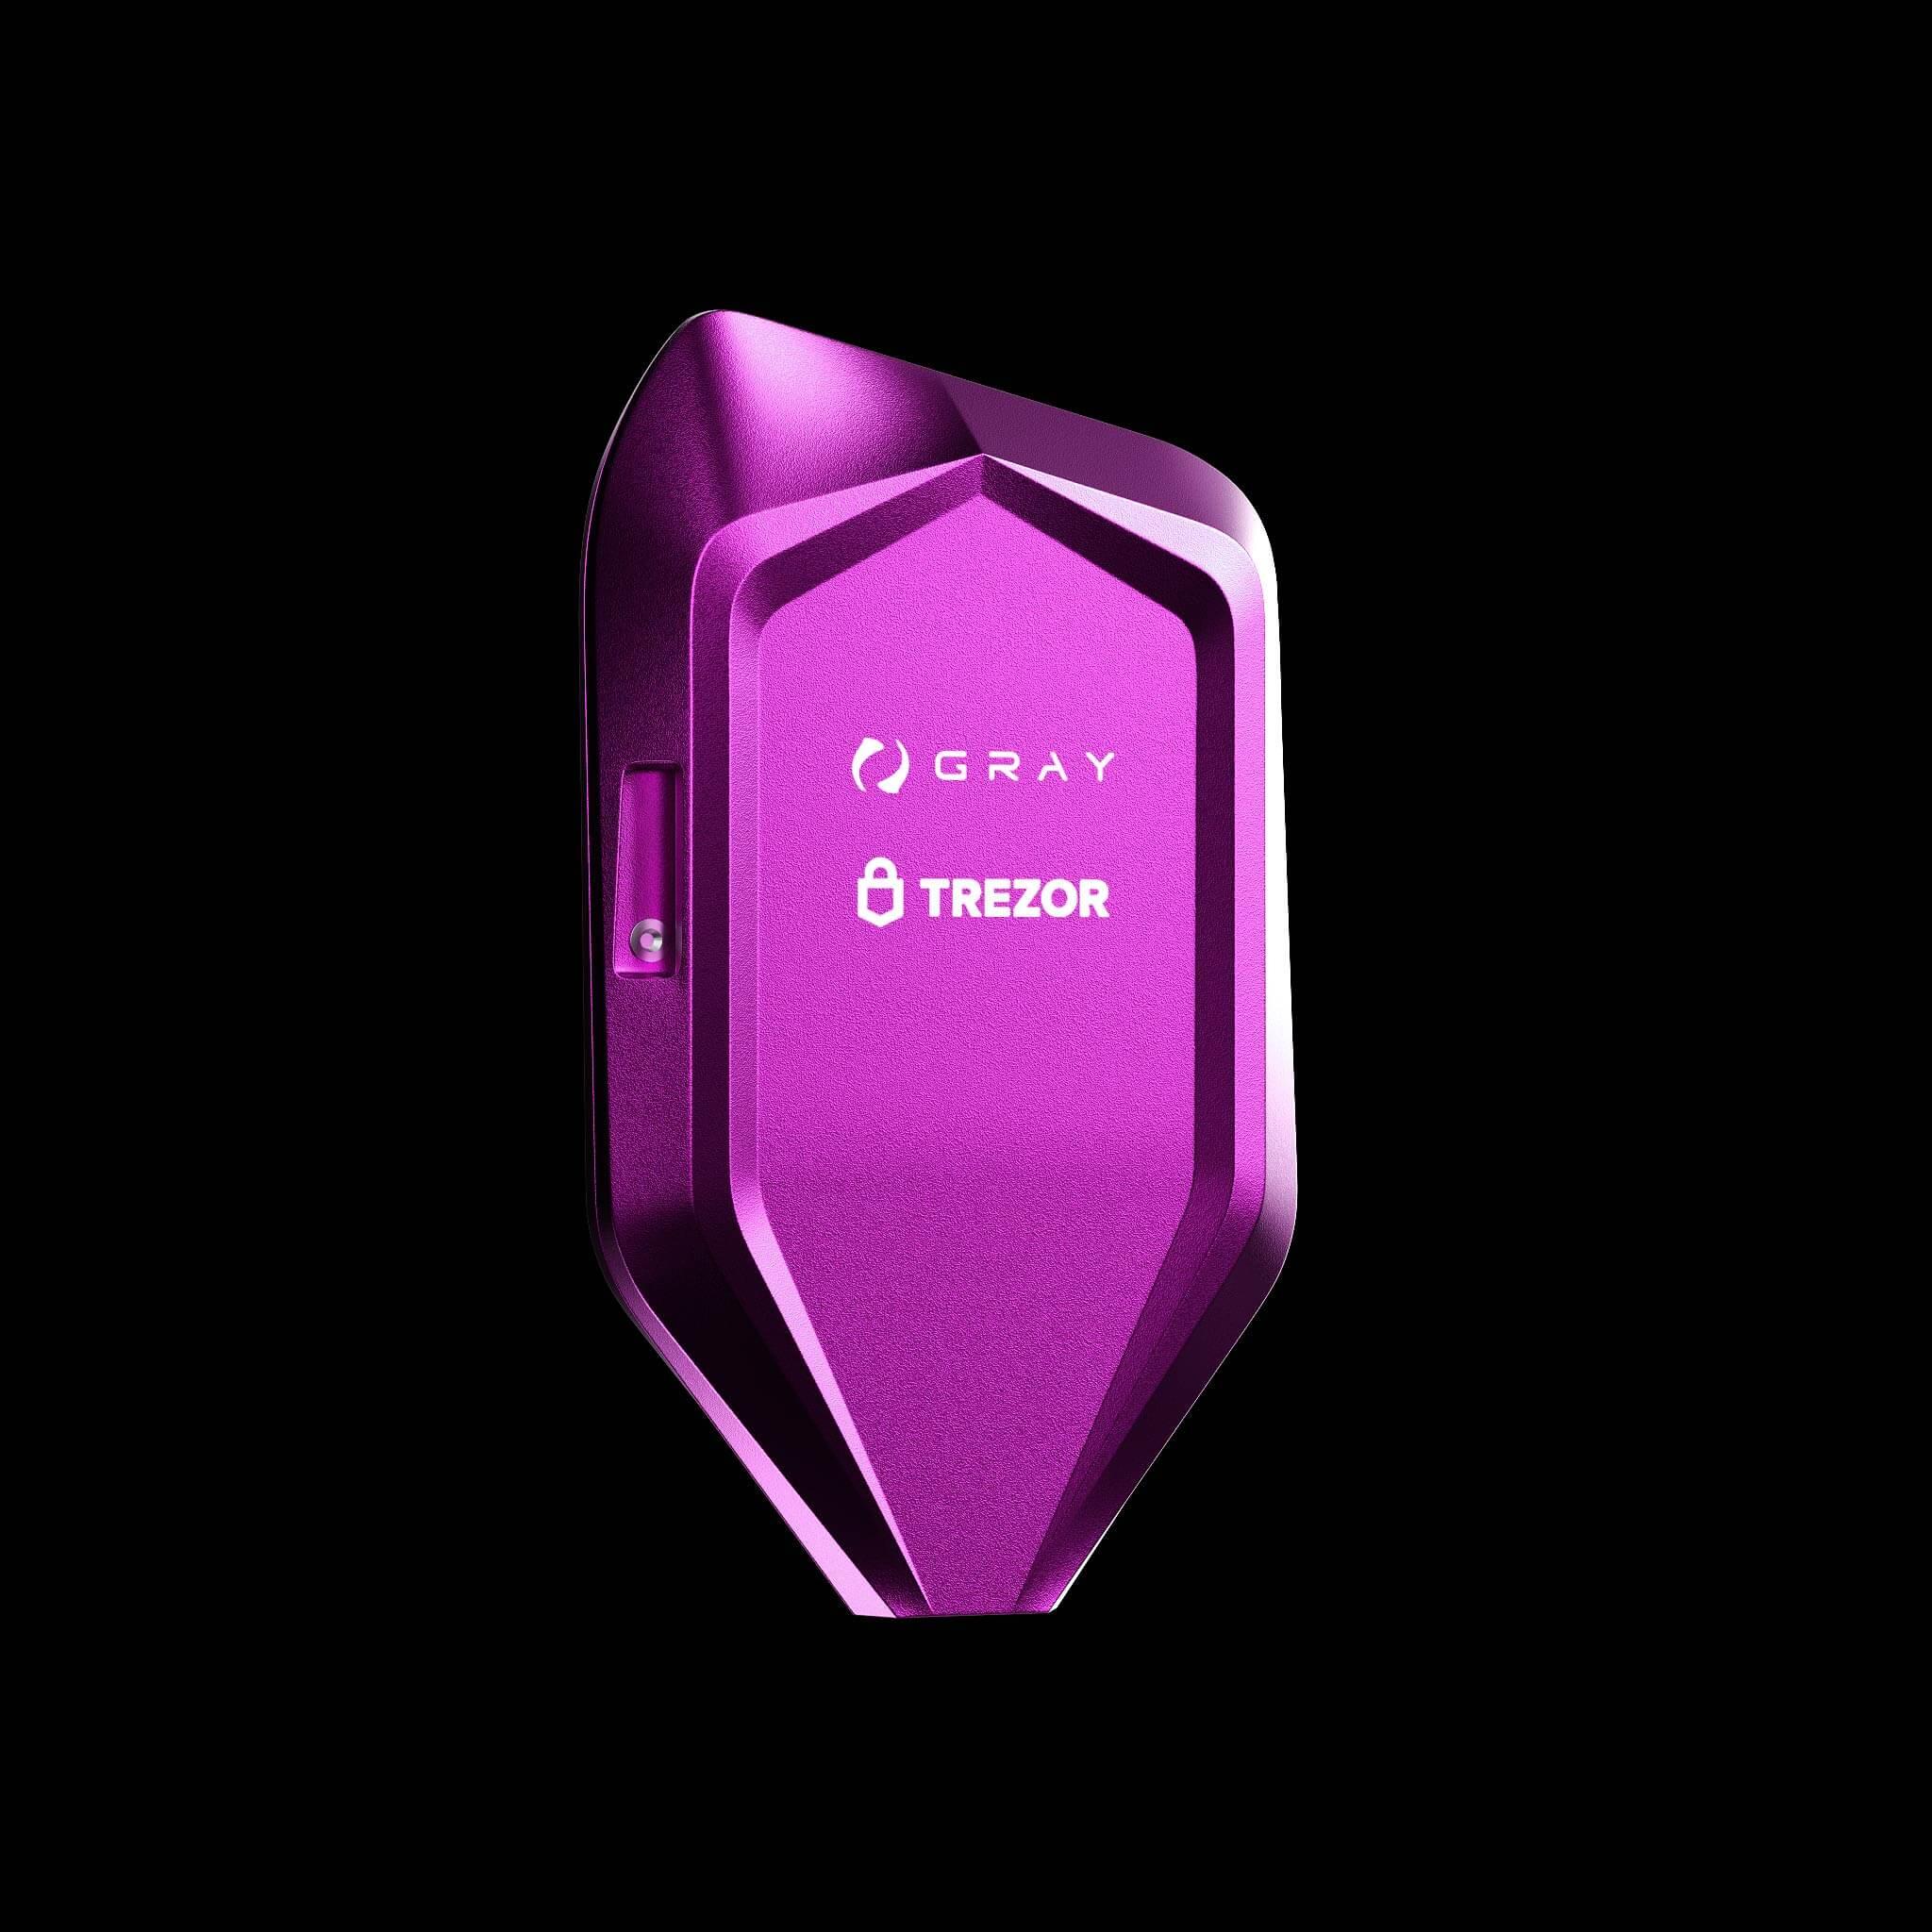 corazon purple trezor model t crypto wallet